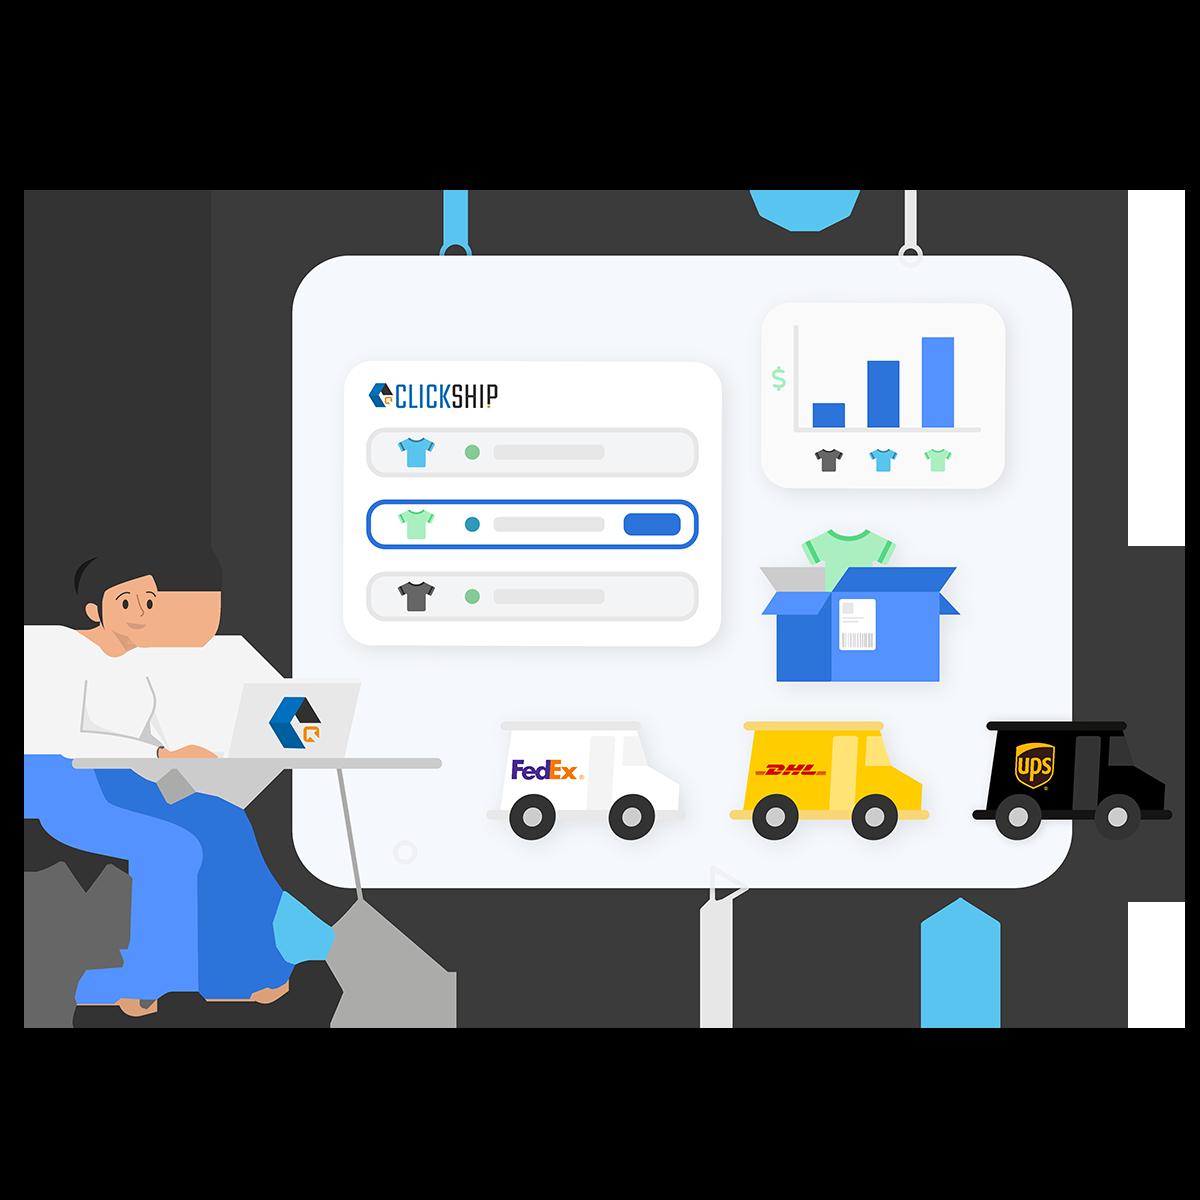 Using ClickShip's Interface